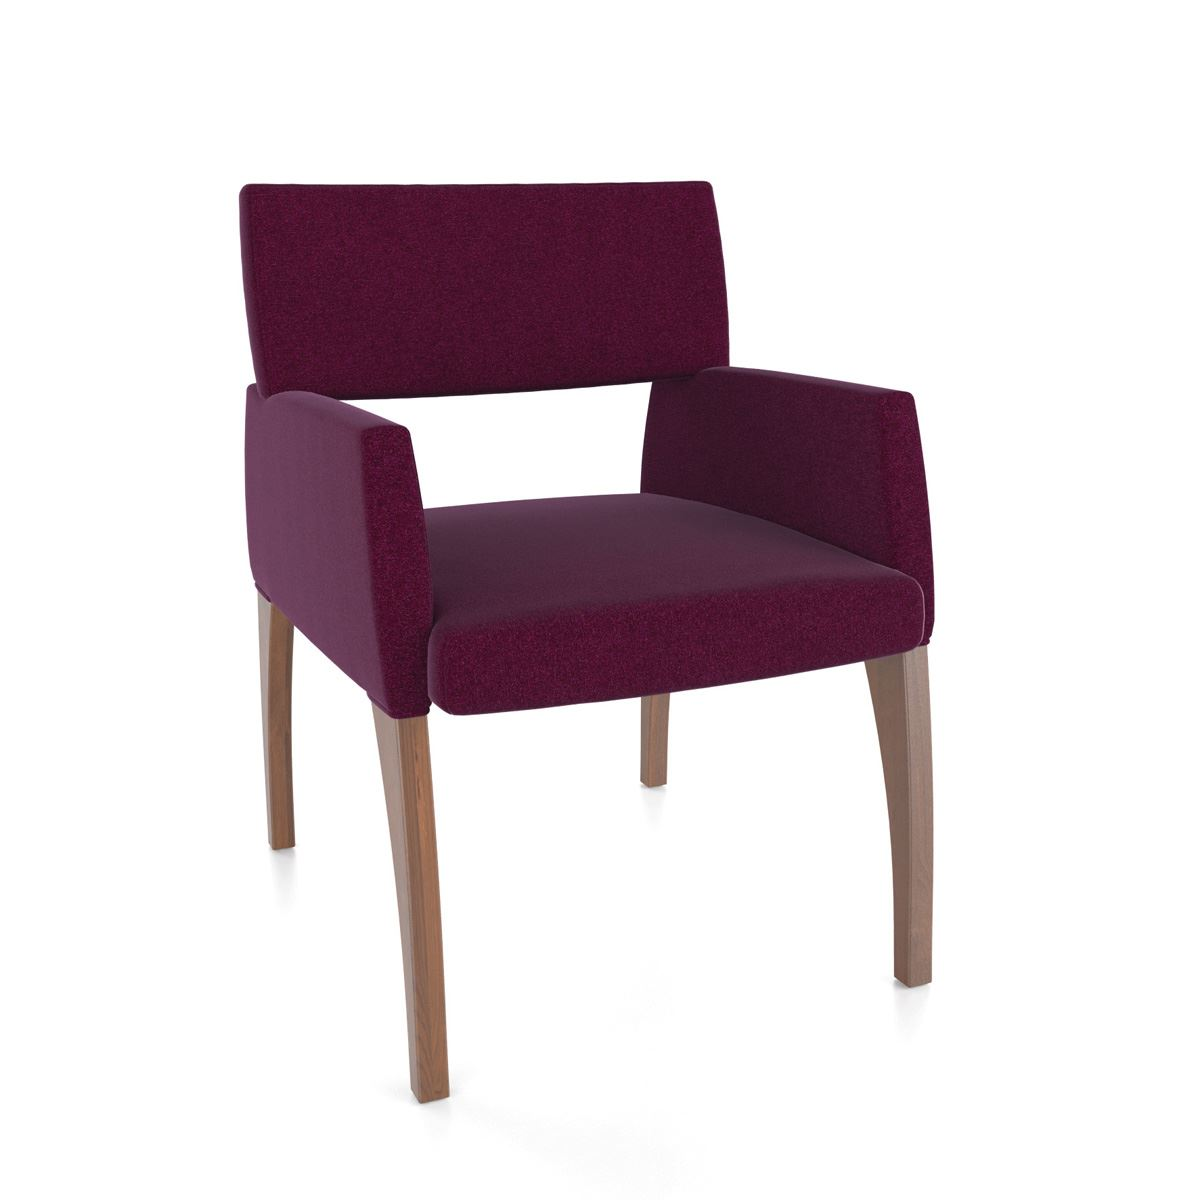 Upholstered Arm Chair Dining Set  King Dinettes  Custom